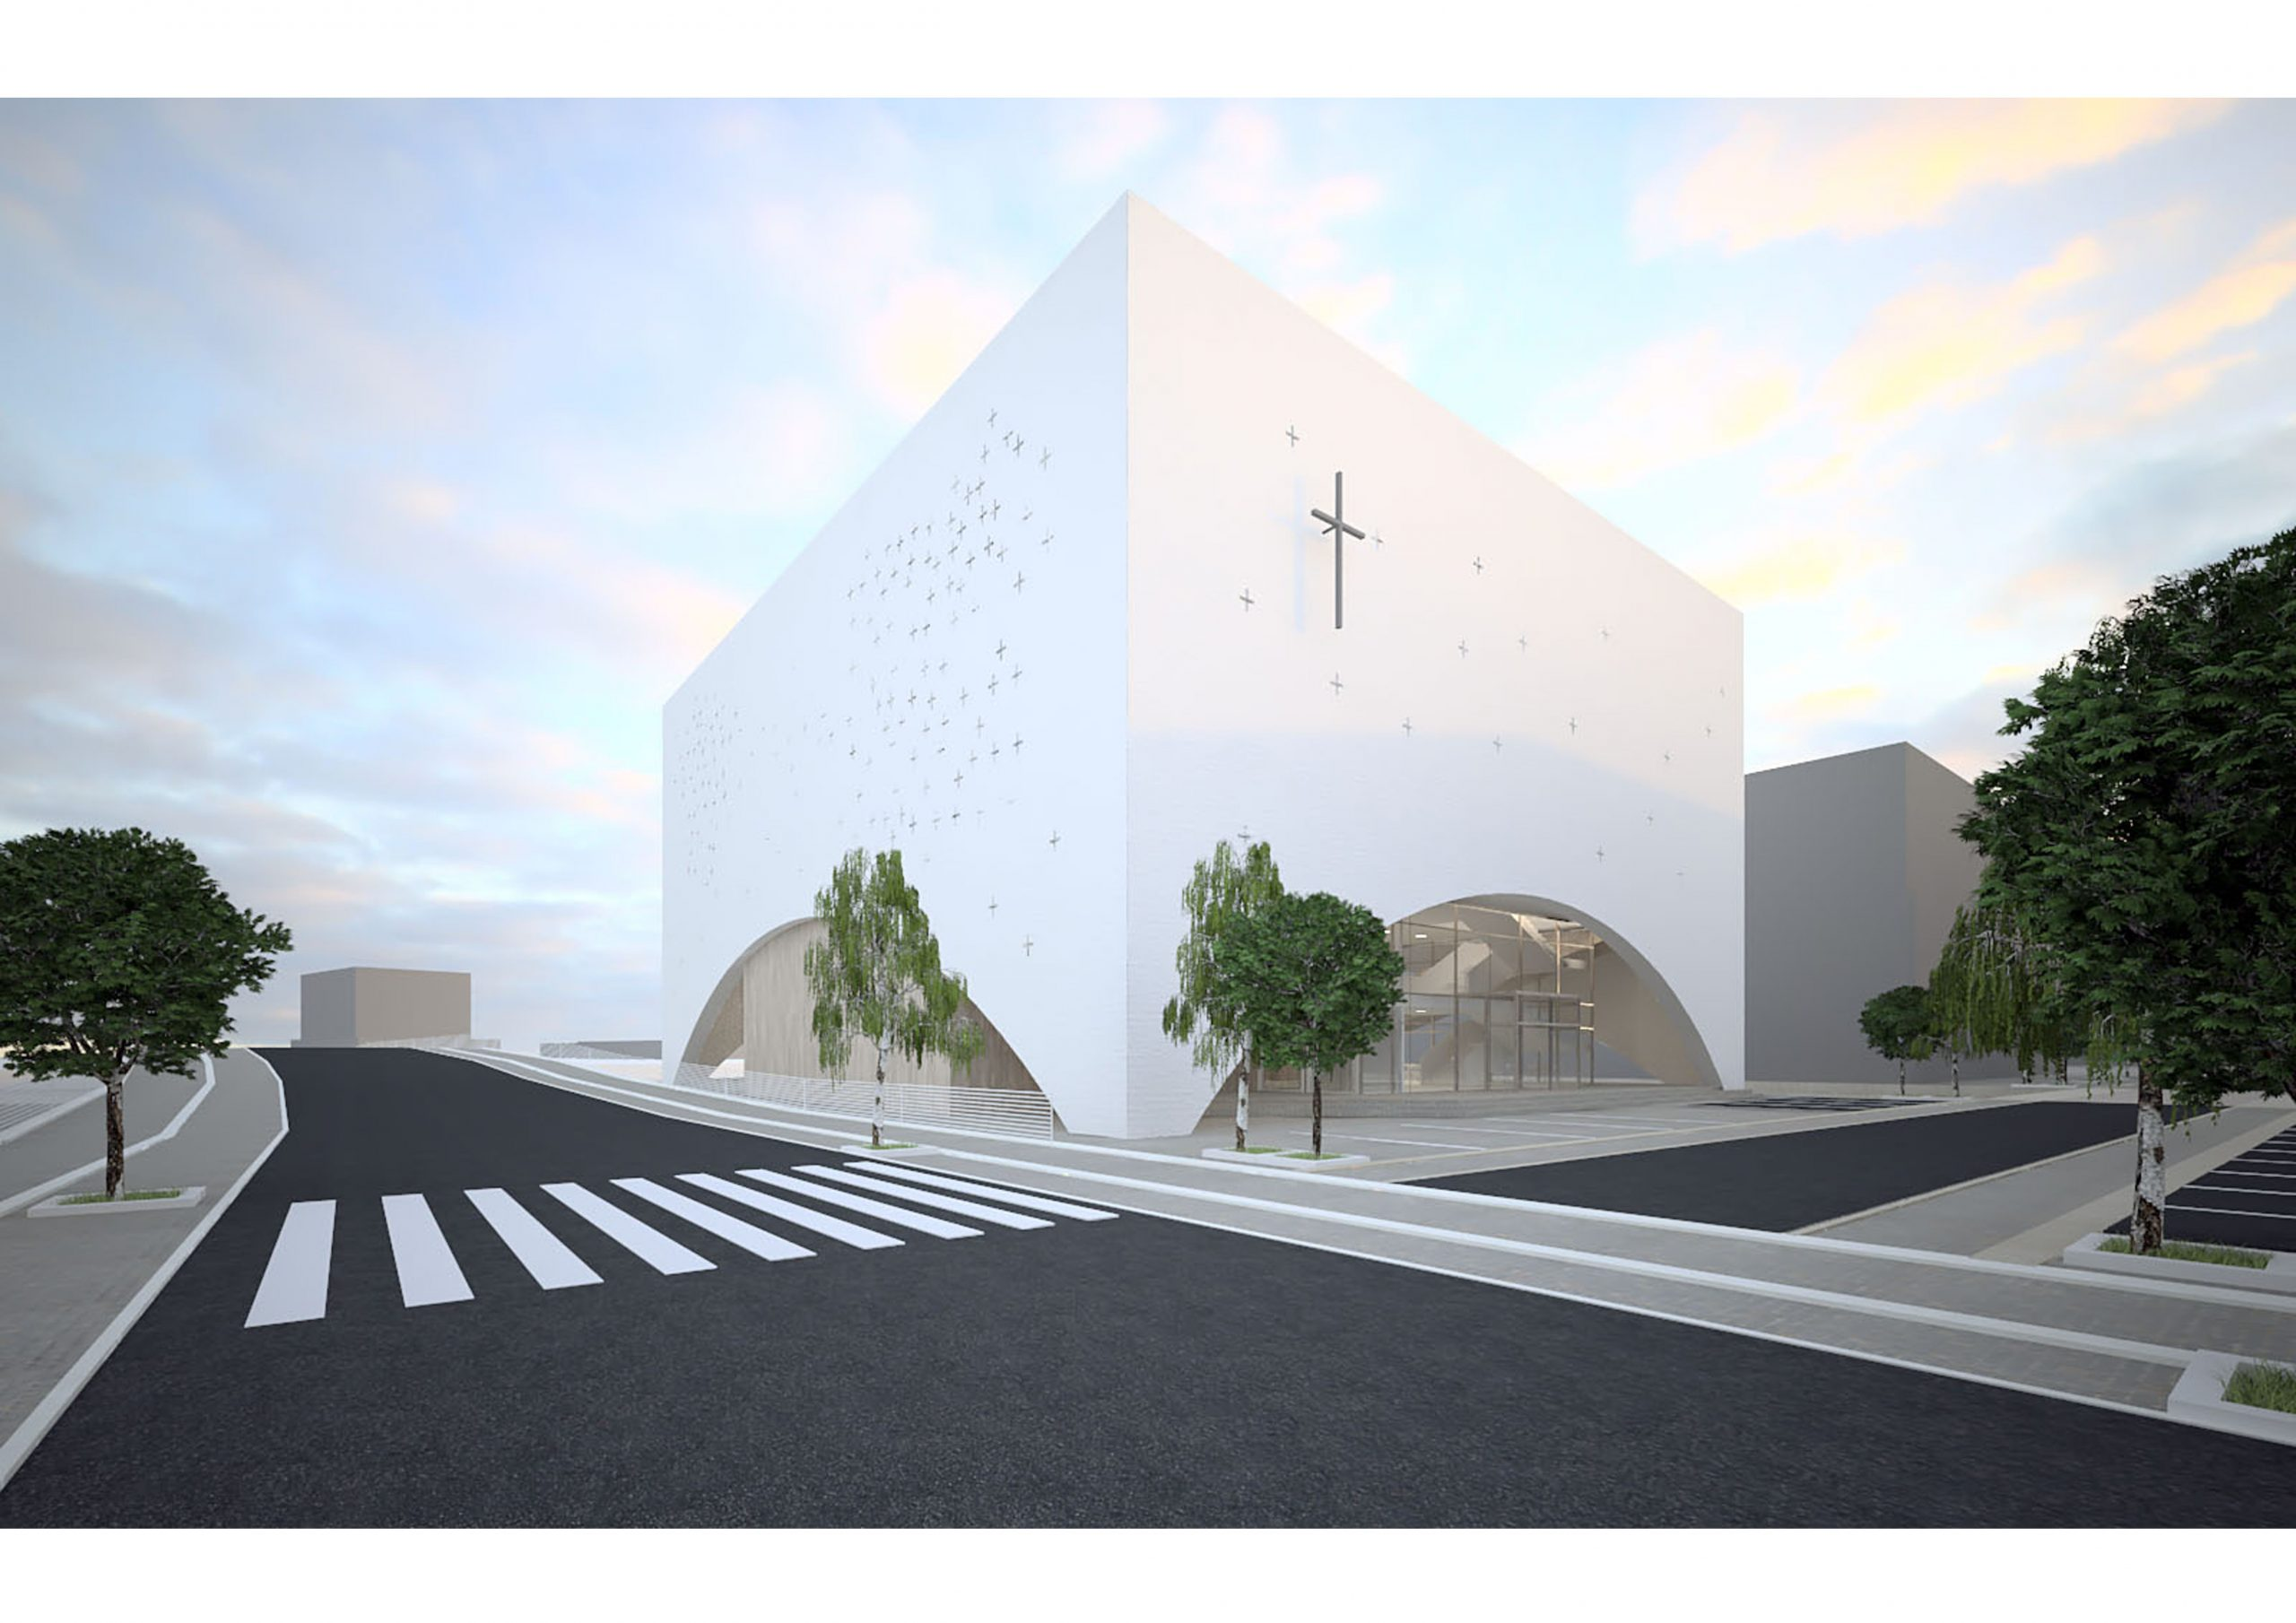 https://nbc-arhitect.ro/wp-content/uploads/2020/10/NBC-Arhitect-_-public-buildings-_-Protestant-Church-_-Copenhagen-_-exterior-view_2-scaled.jpg